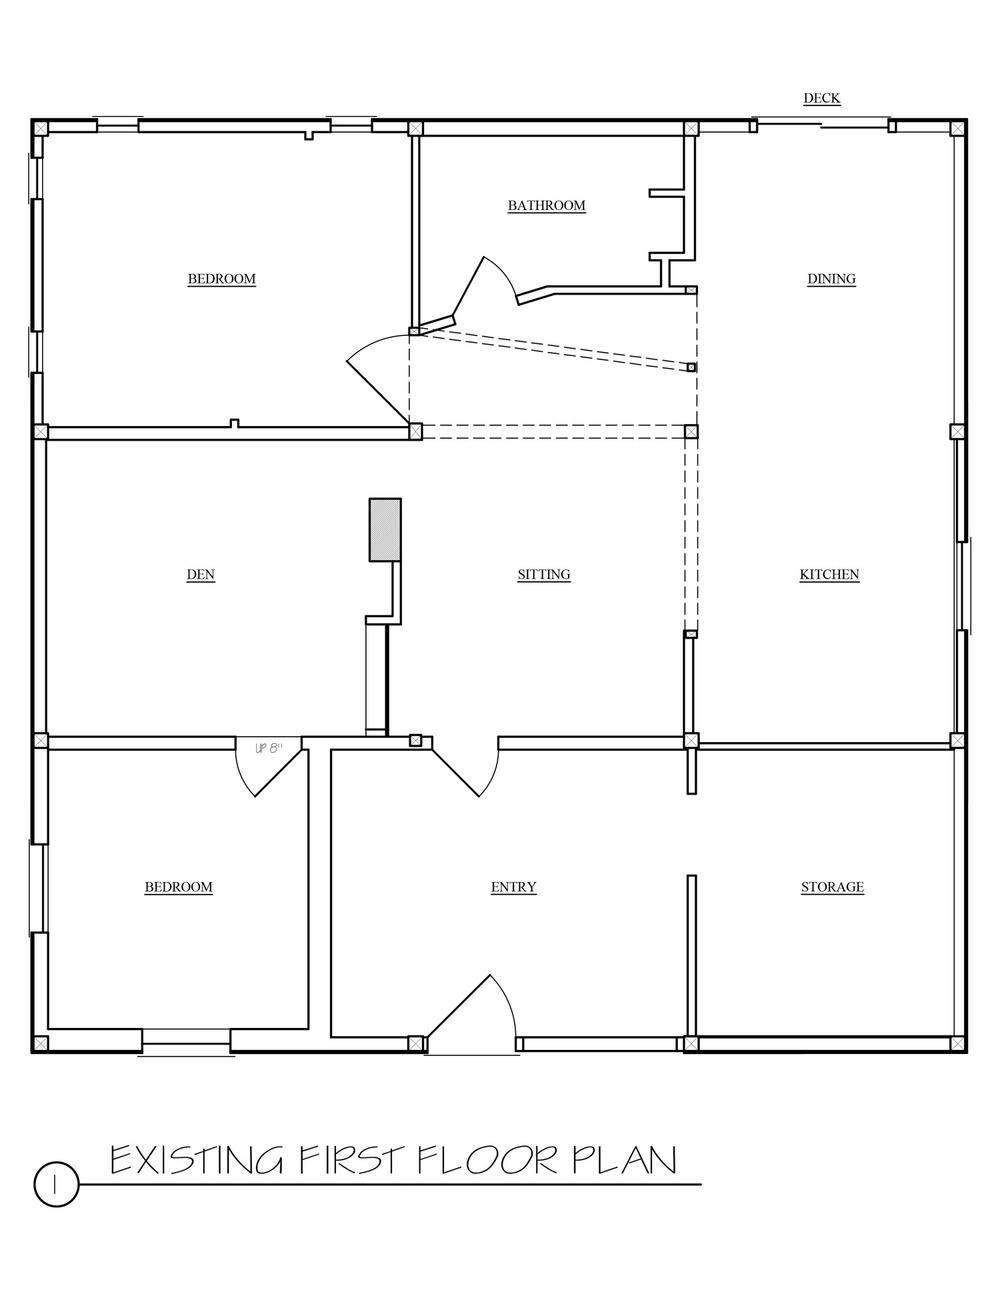 Existing-First-Floor-Plan.upload.jpg